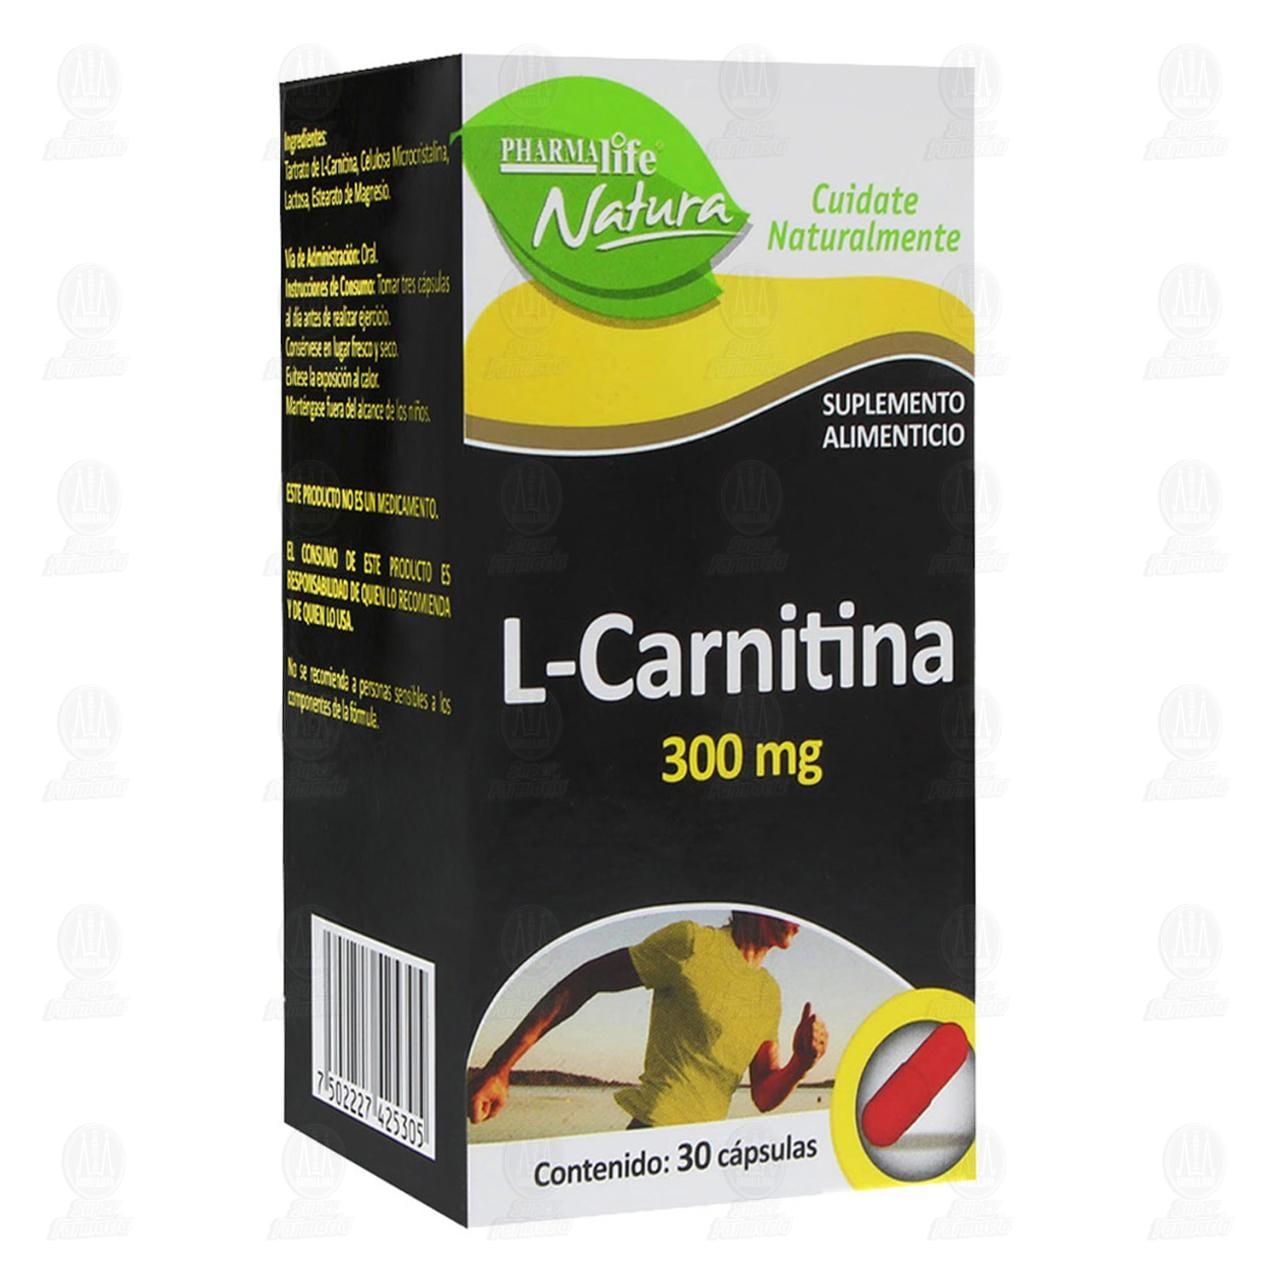 Comprar L-Carnitina 300mg 30 Cápsulas Pharmalife Natura en Farmacias Guadalajara